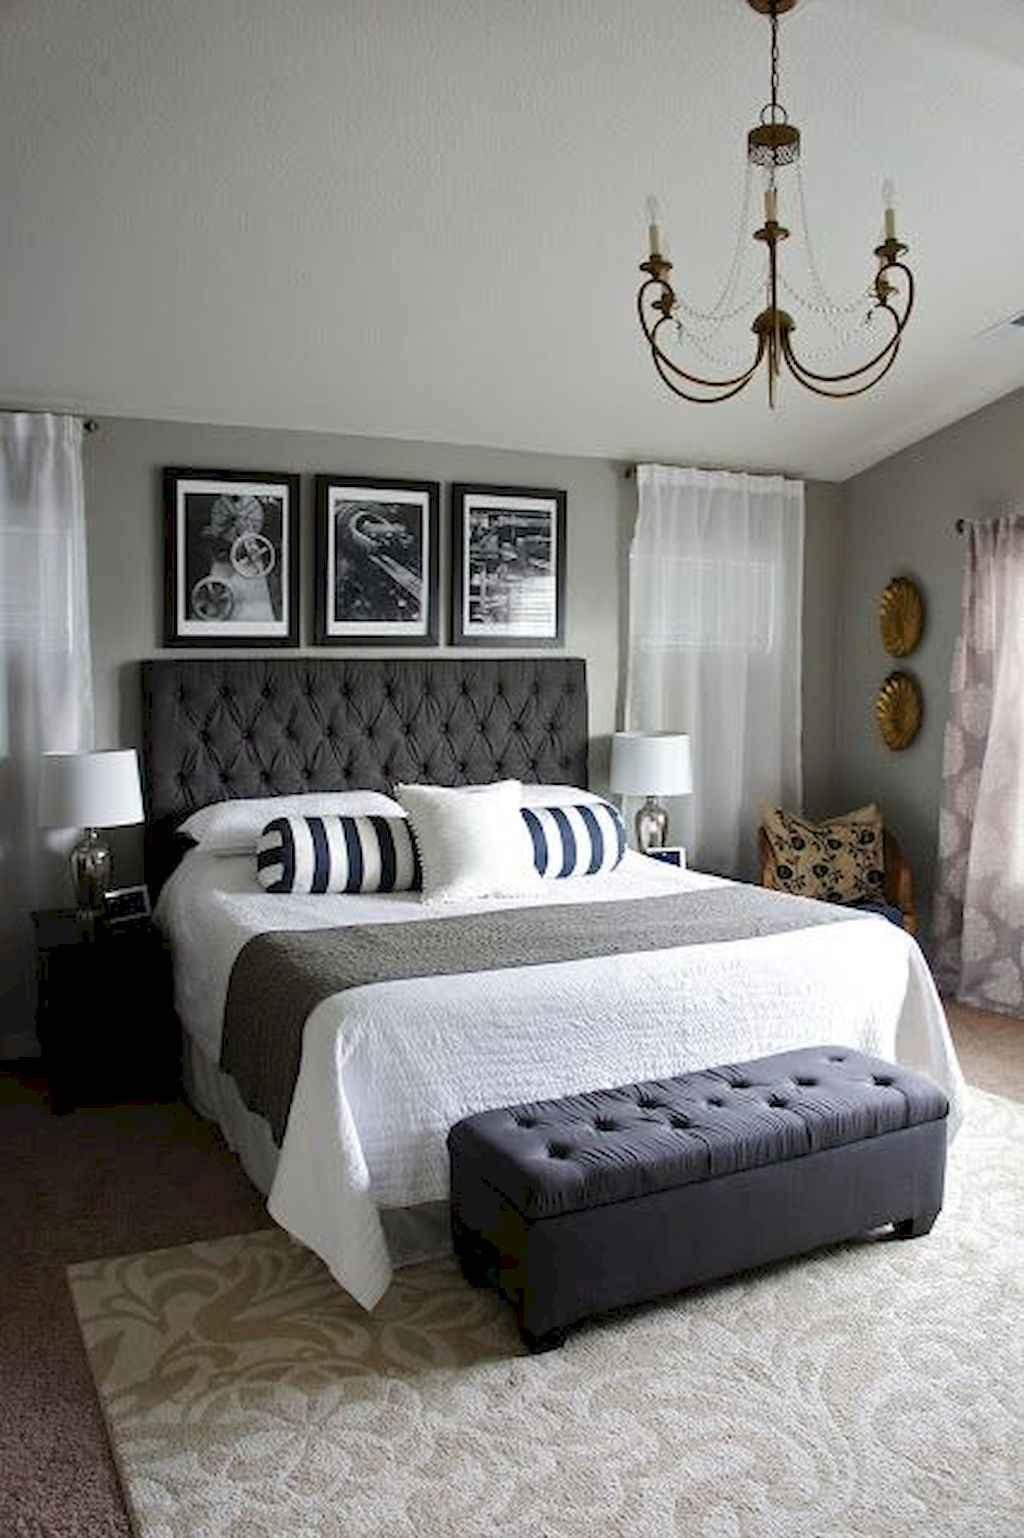 Incredible master bedroom ideas (5)